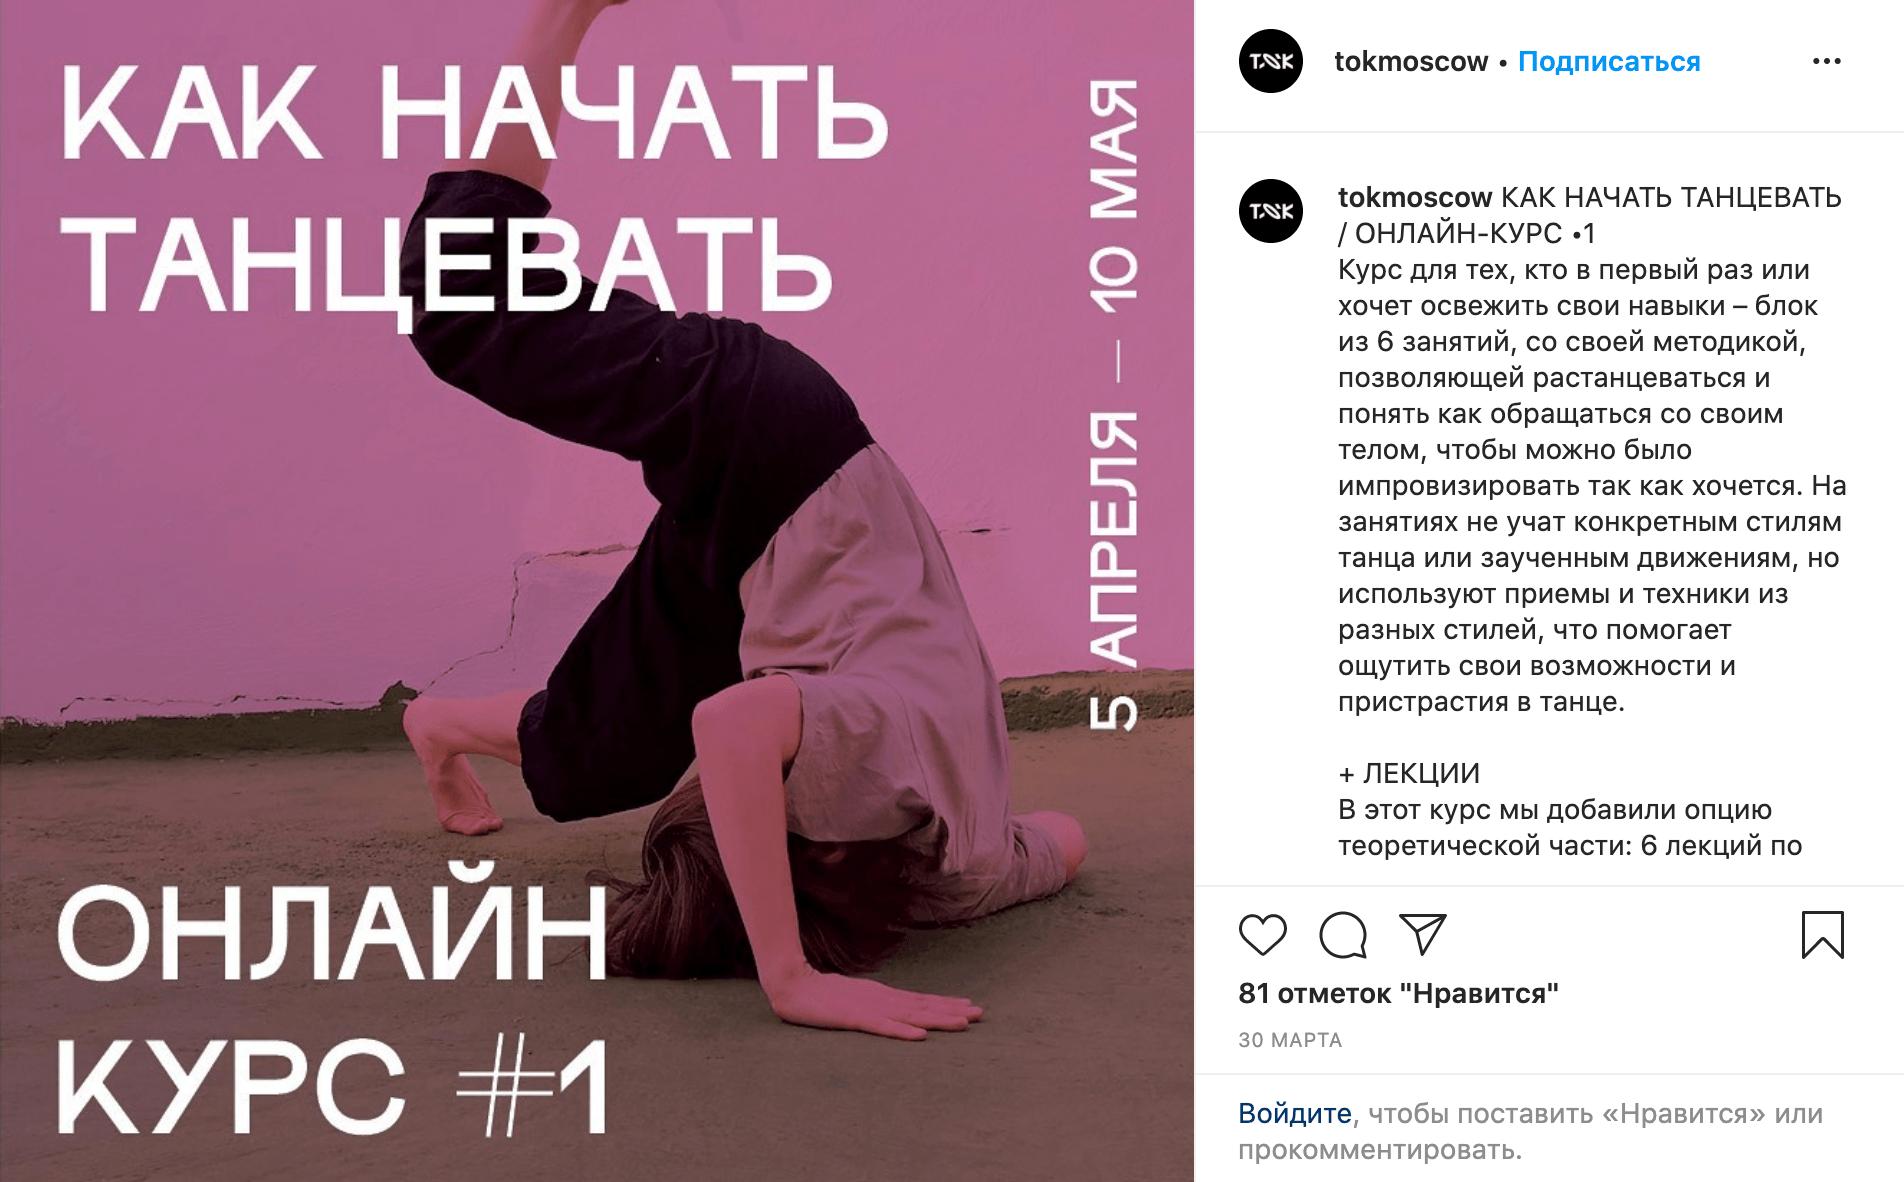 Школа танцев «Ток» во время паузы в офлайн-занятиях сделала онлайн-обучение через «Зум»